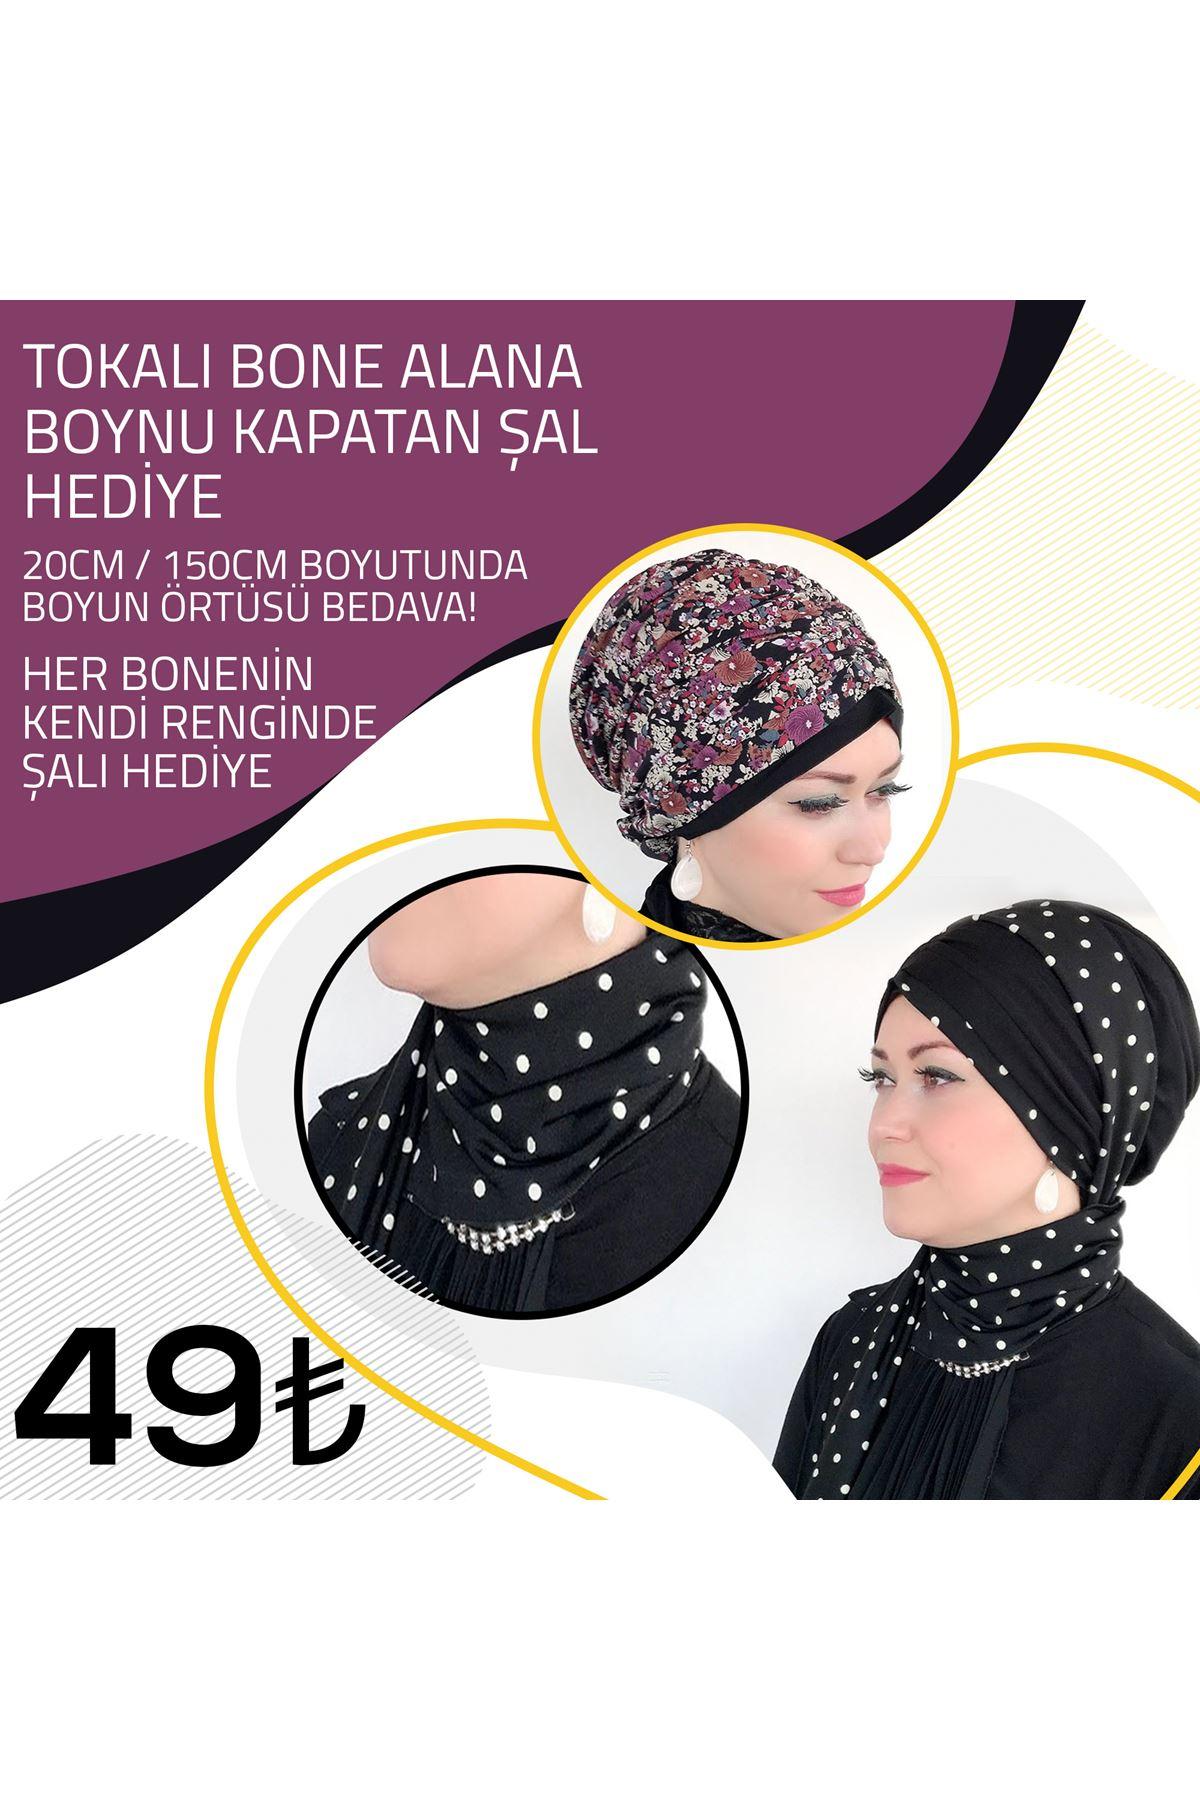 Ebru Bahar Desenli Siyah Tokalı Bone + Ebru Bahar Desenli Şal